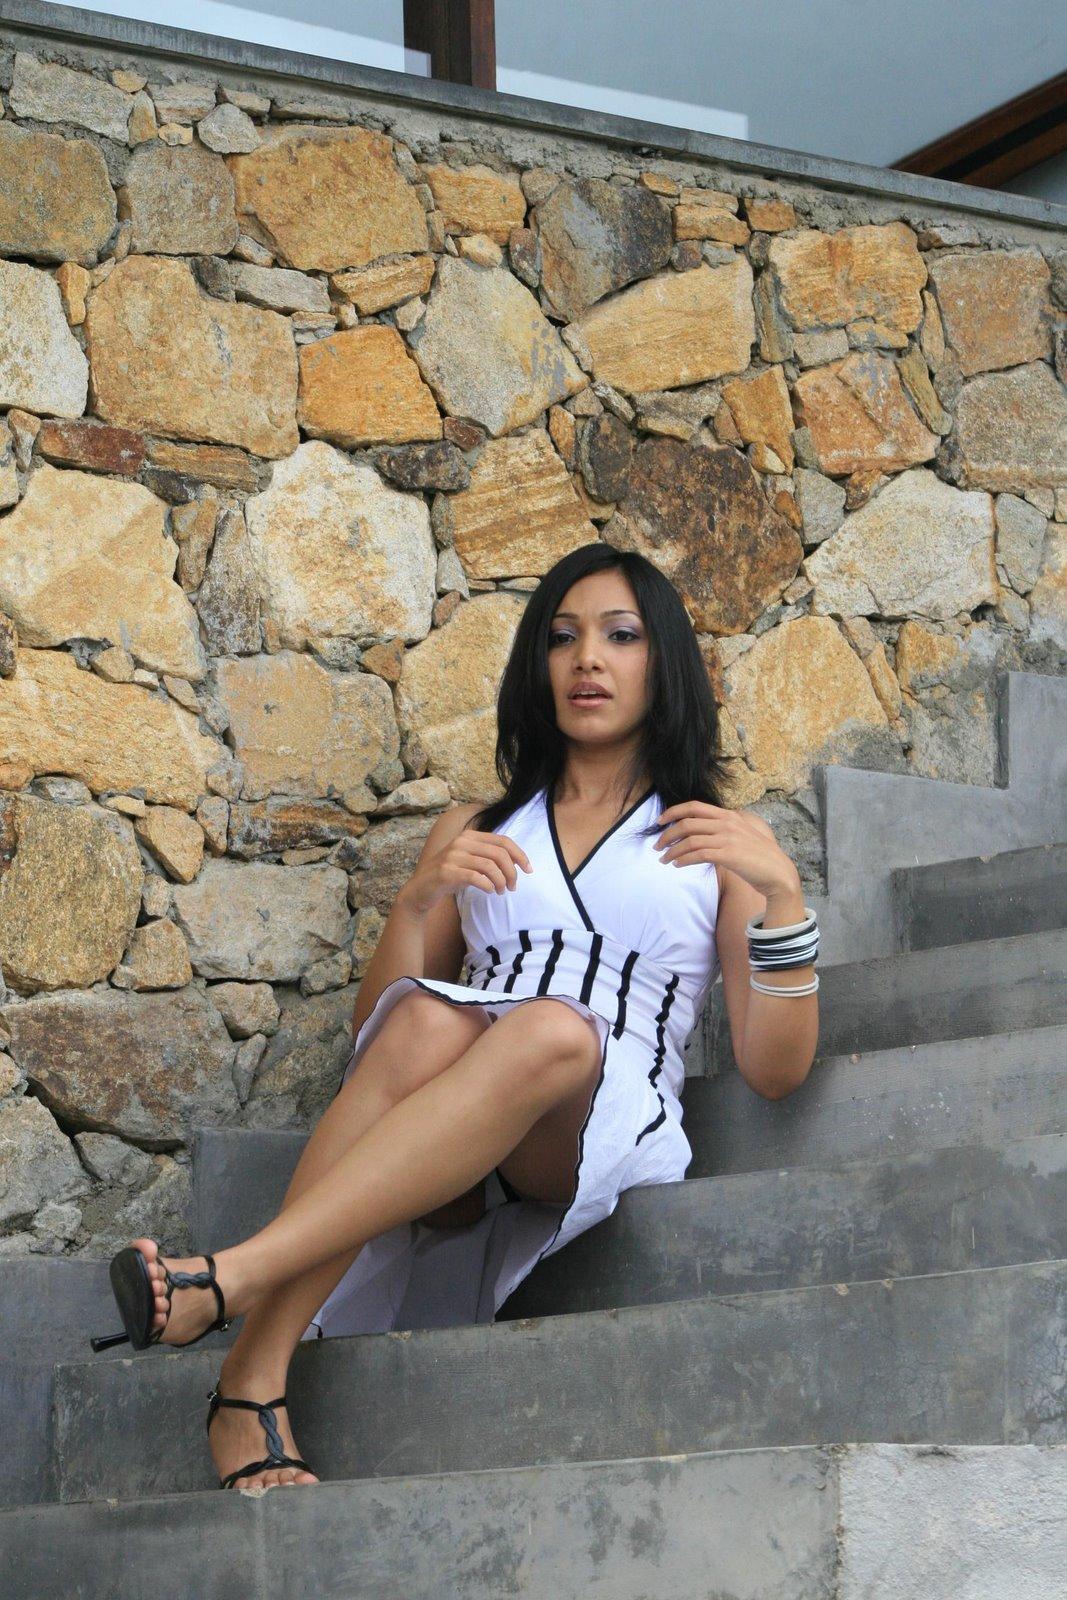 Sri lankan hot girls photos. Lankan Girls Hot Sexy Photos